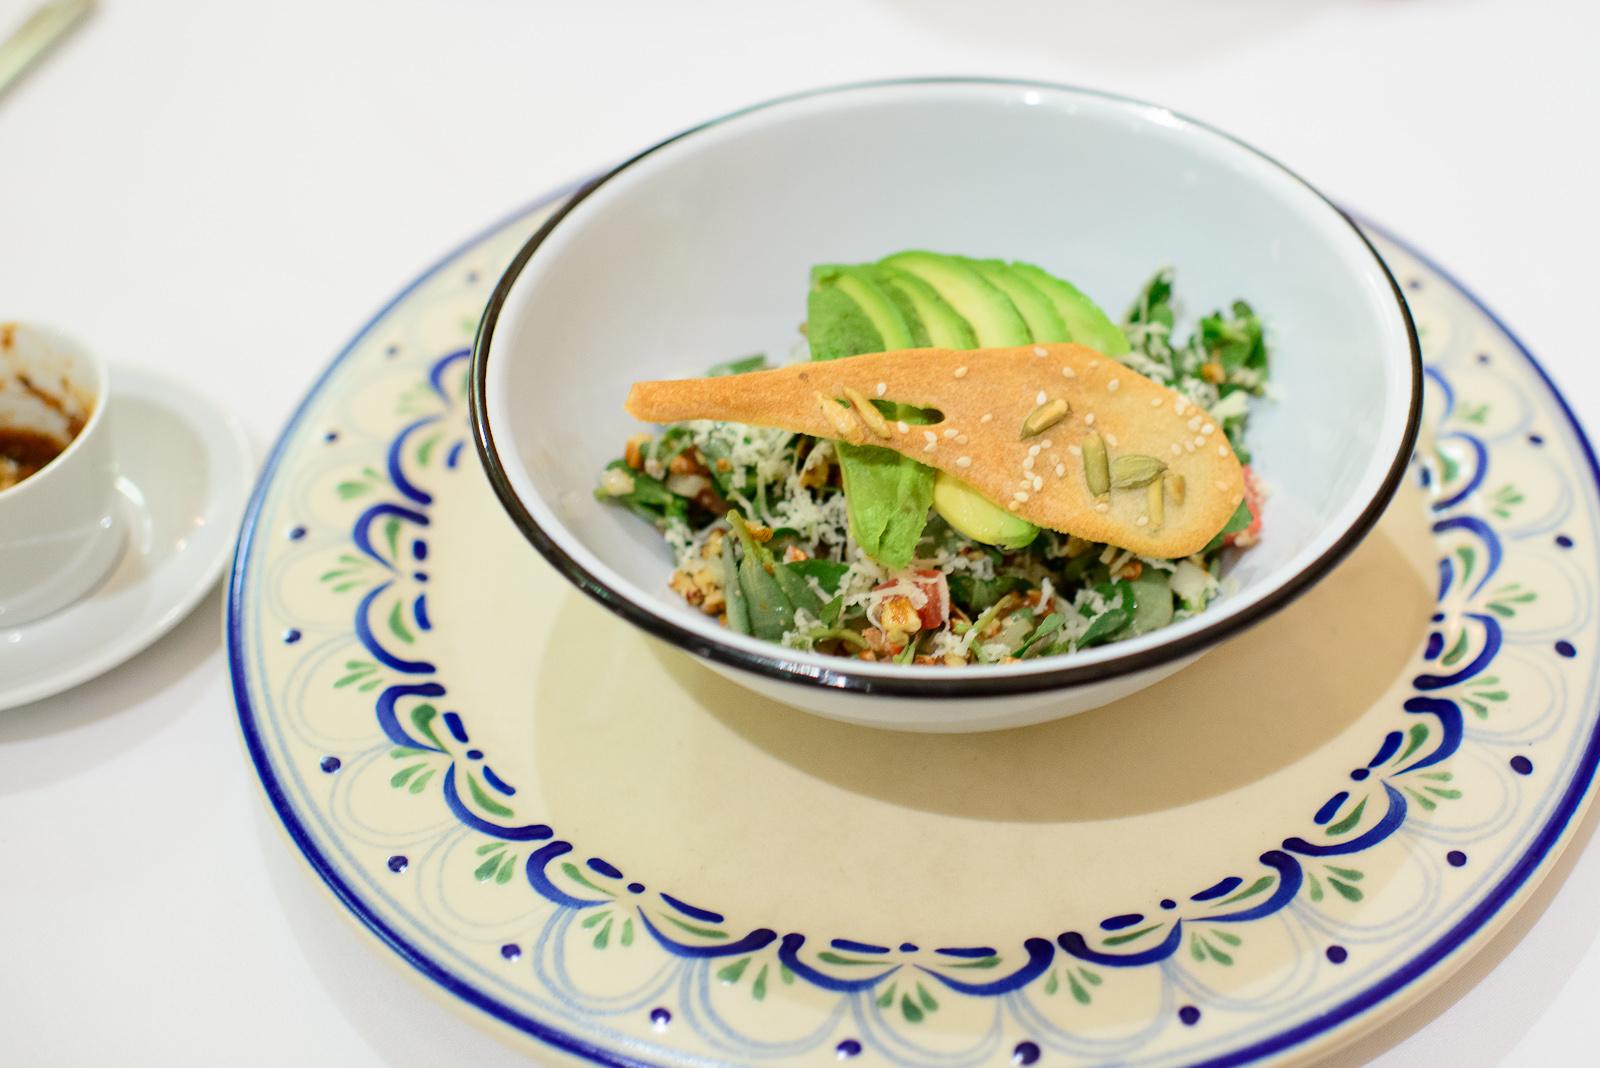 Ensalada de verdolagas (pursalane salad)